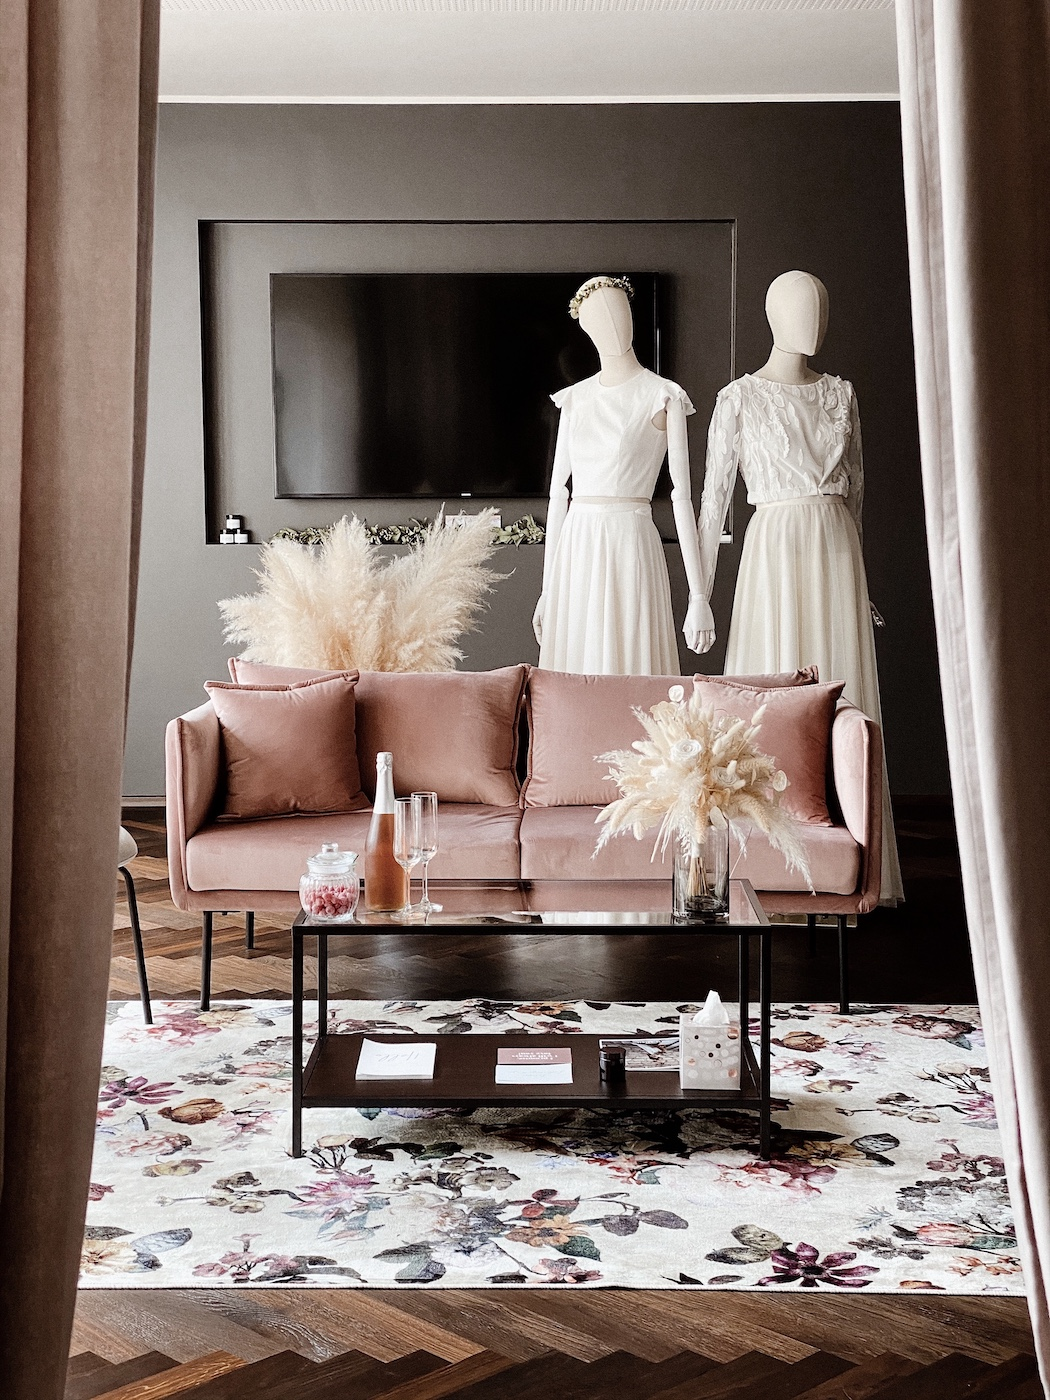 Eve-Bridal | Brautkleider & Accessoires